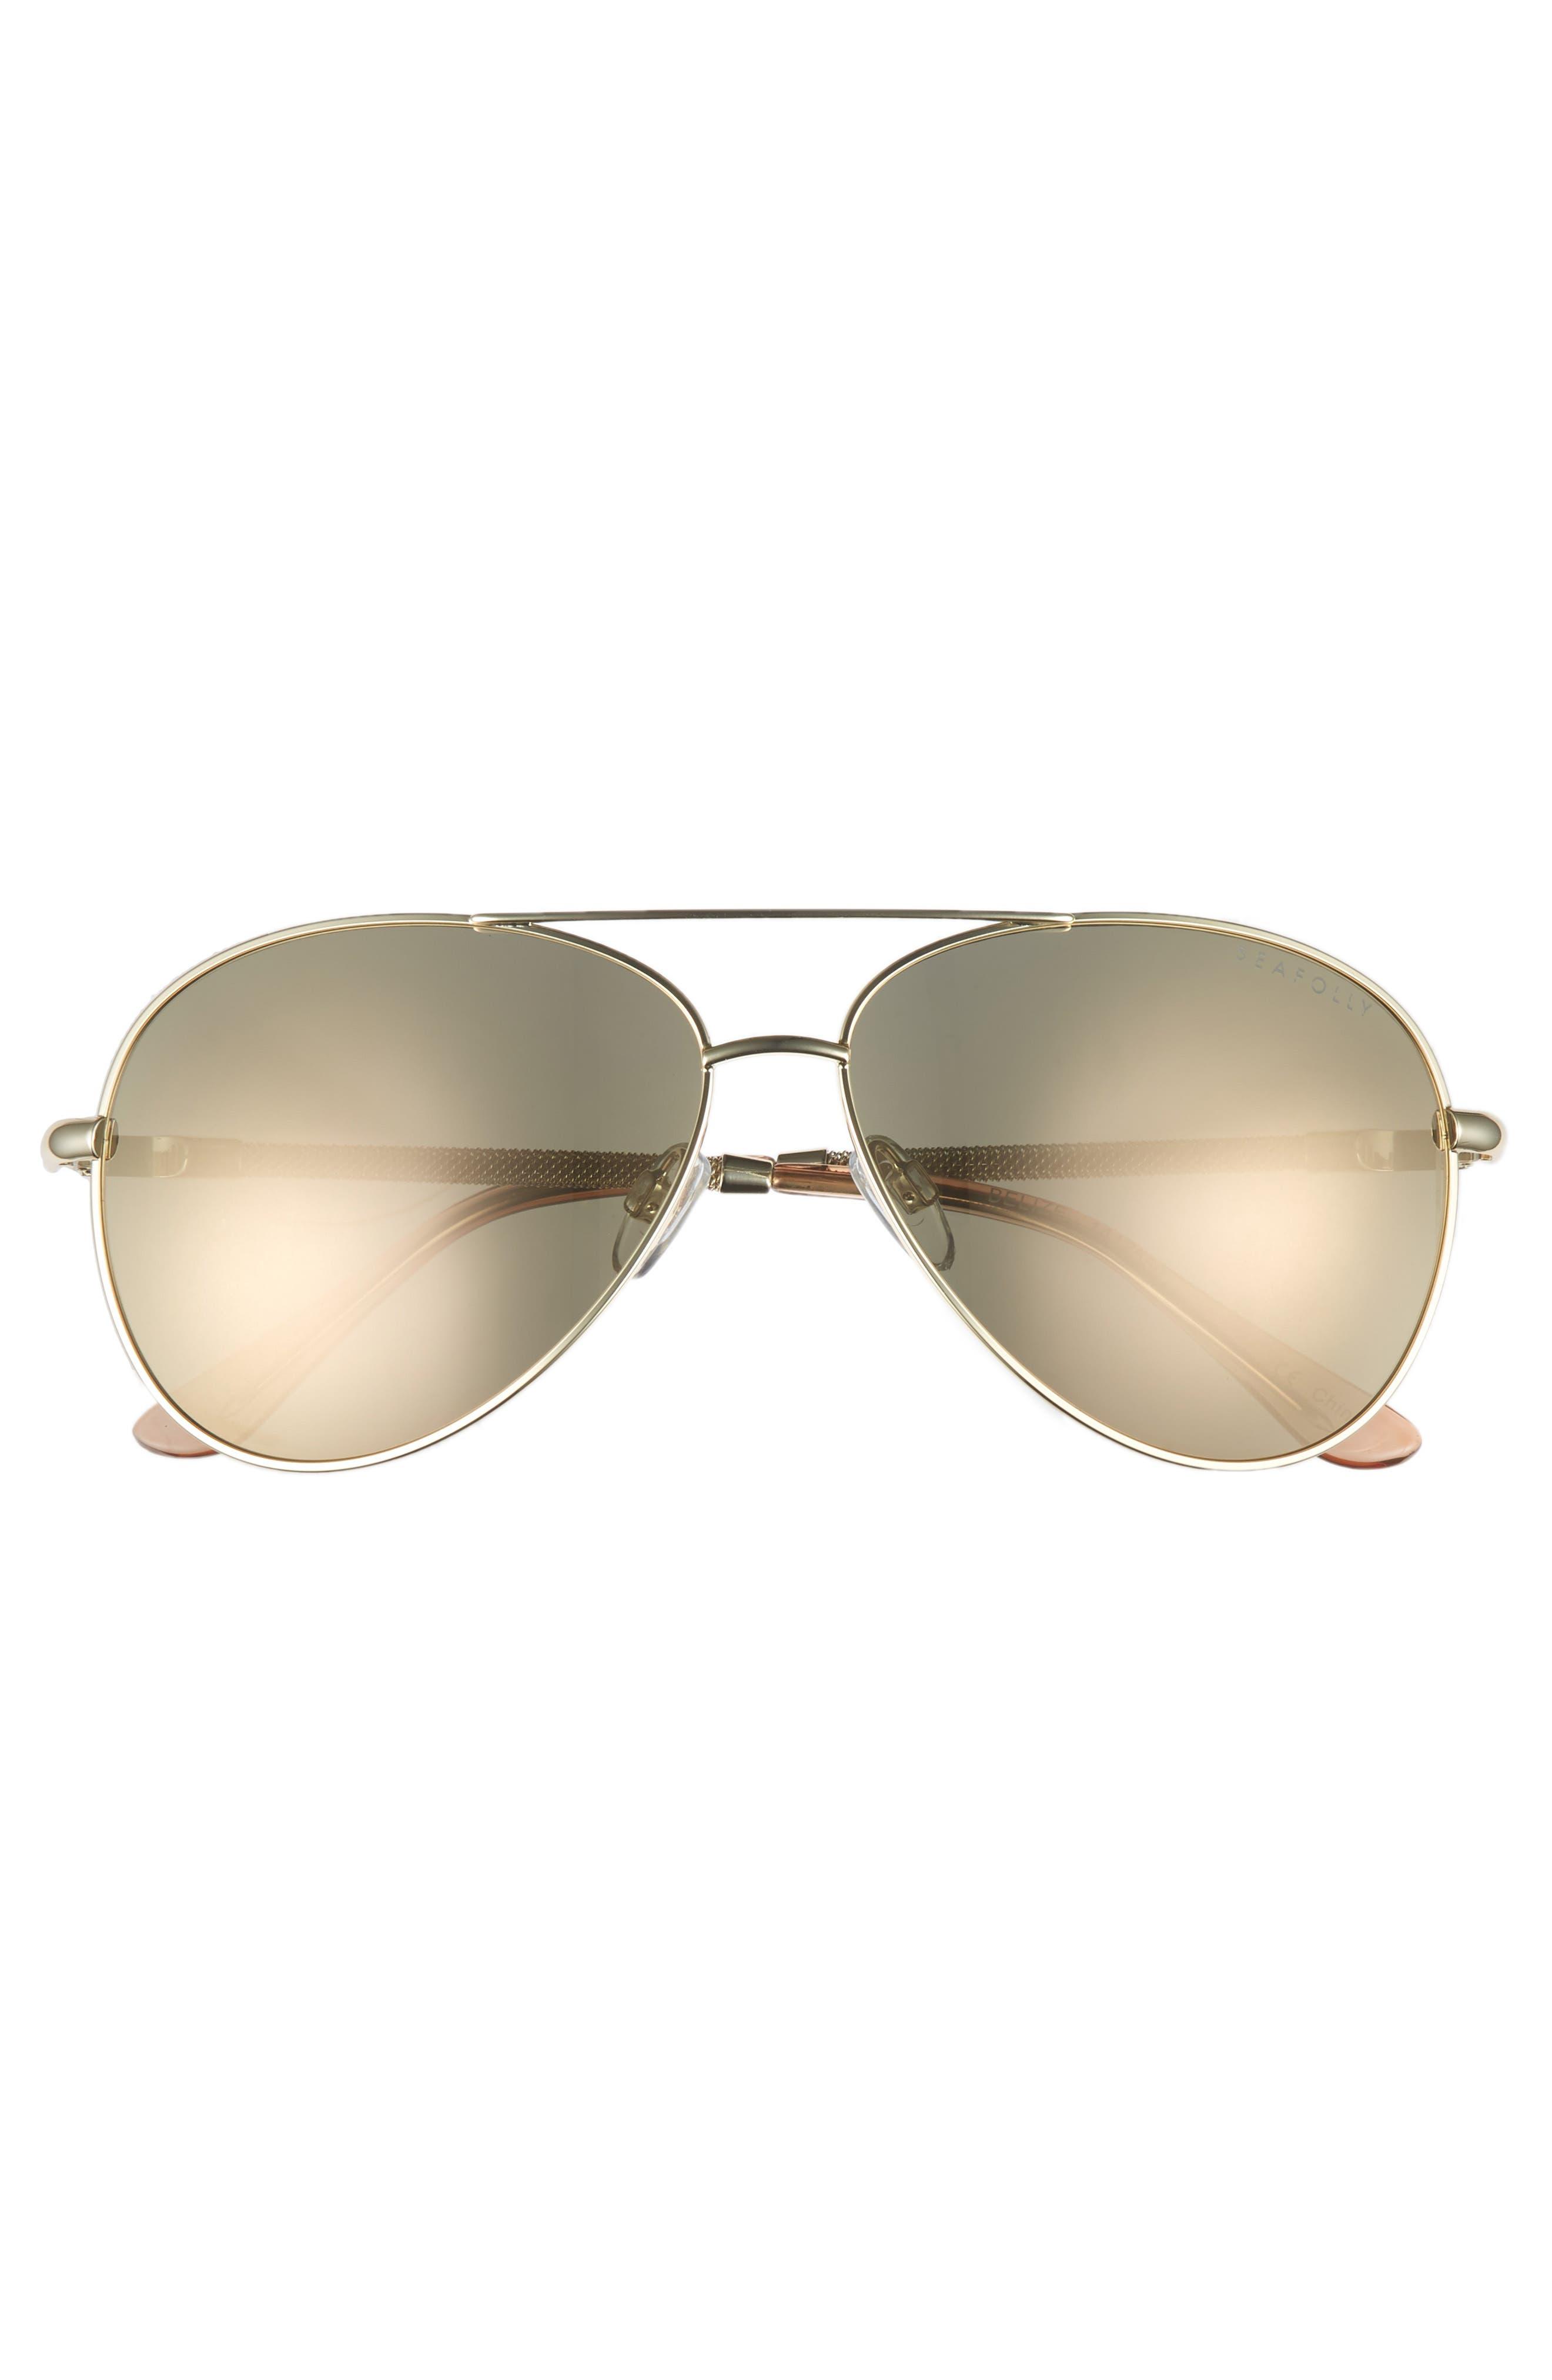 Belize 59mm Aviator Sunglasses,                             Alternate thumbnail 3, color,